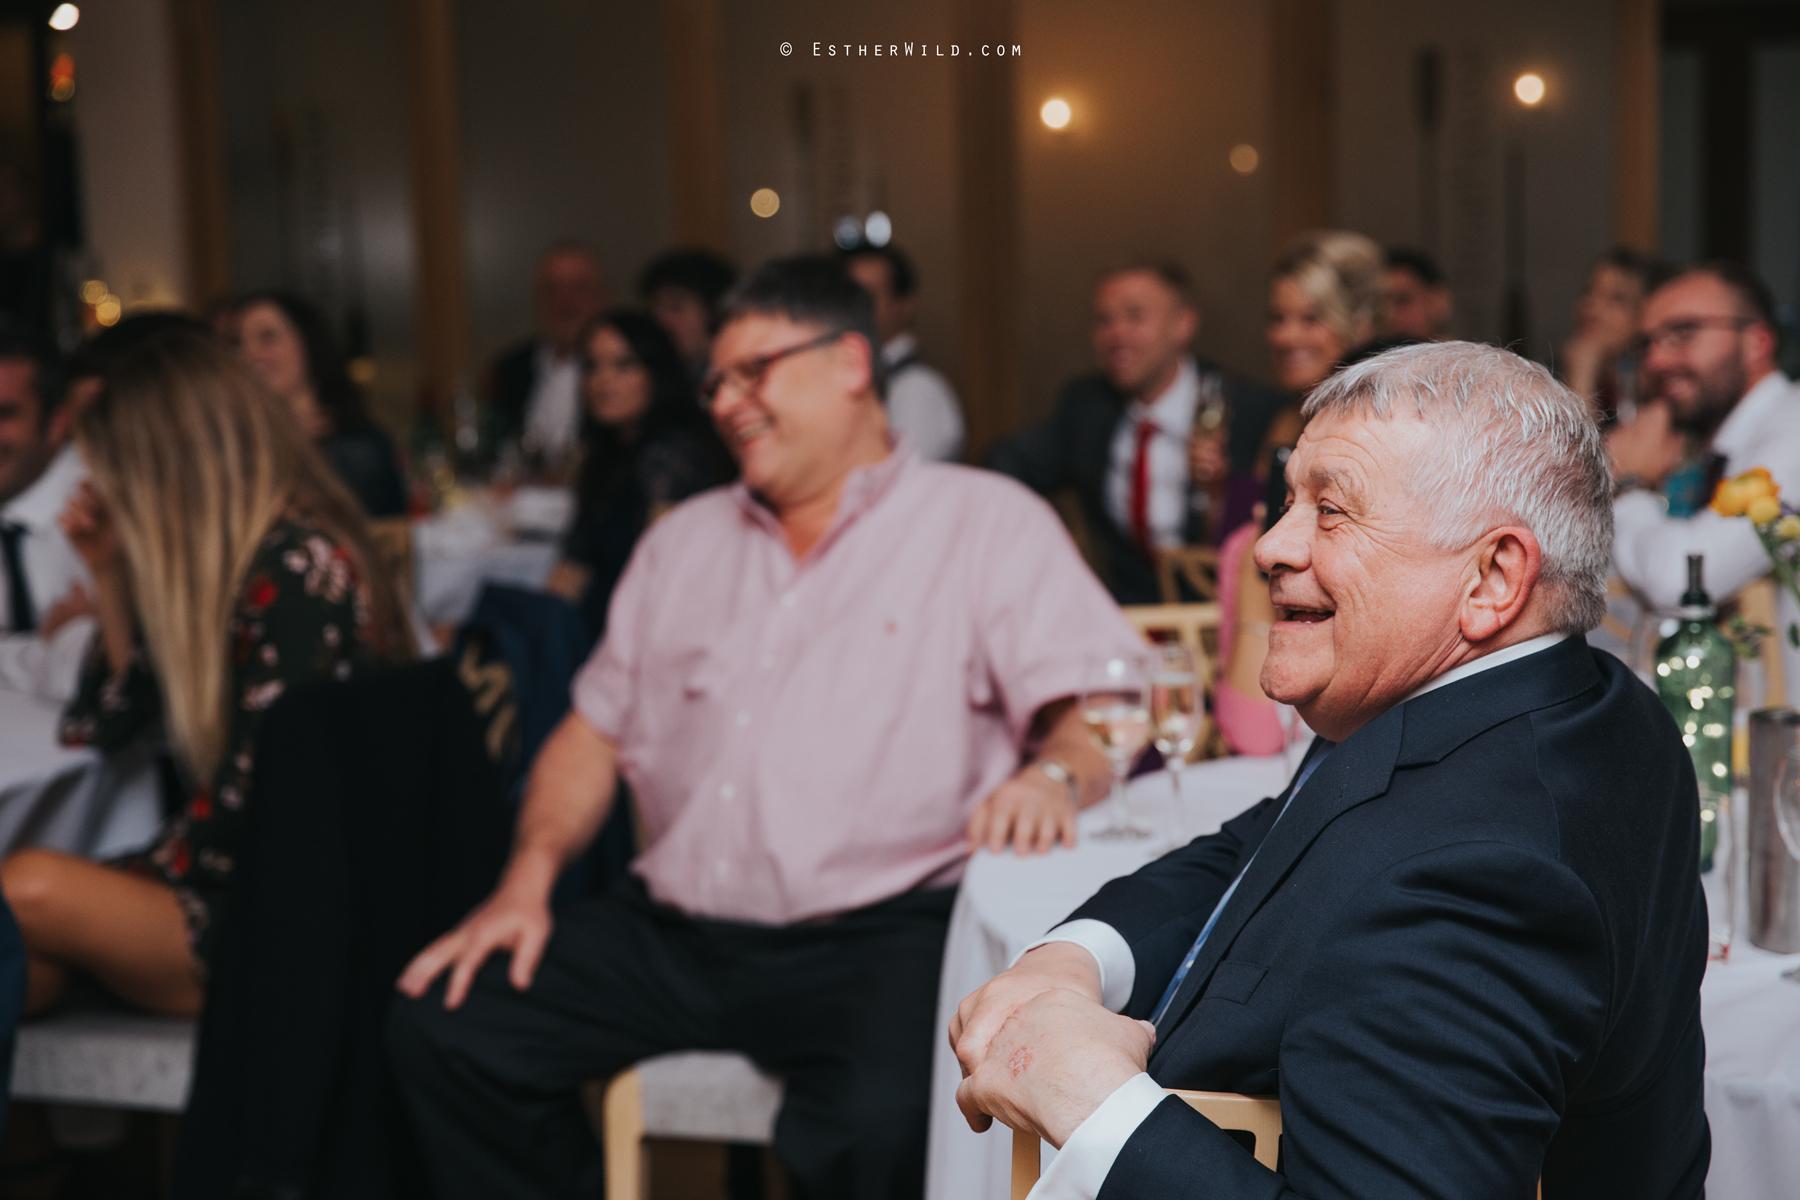 The_BoatHouse_Wedding_Venue_Ormesby_Norfolk_Broads_Boat_Wedding_Photography_Esther_Wild_Photographer_IMG_3184.jpg